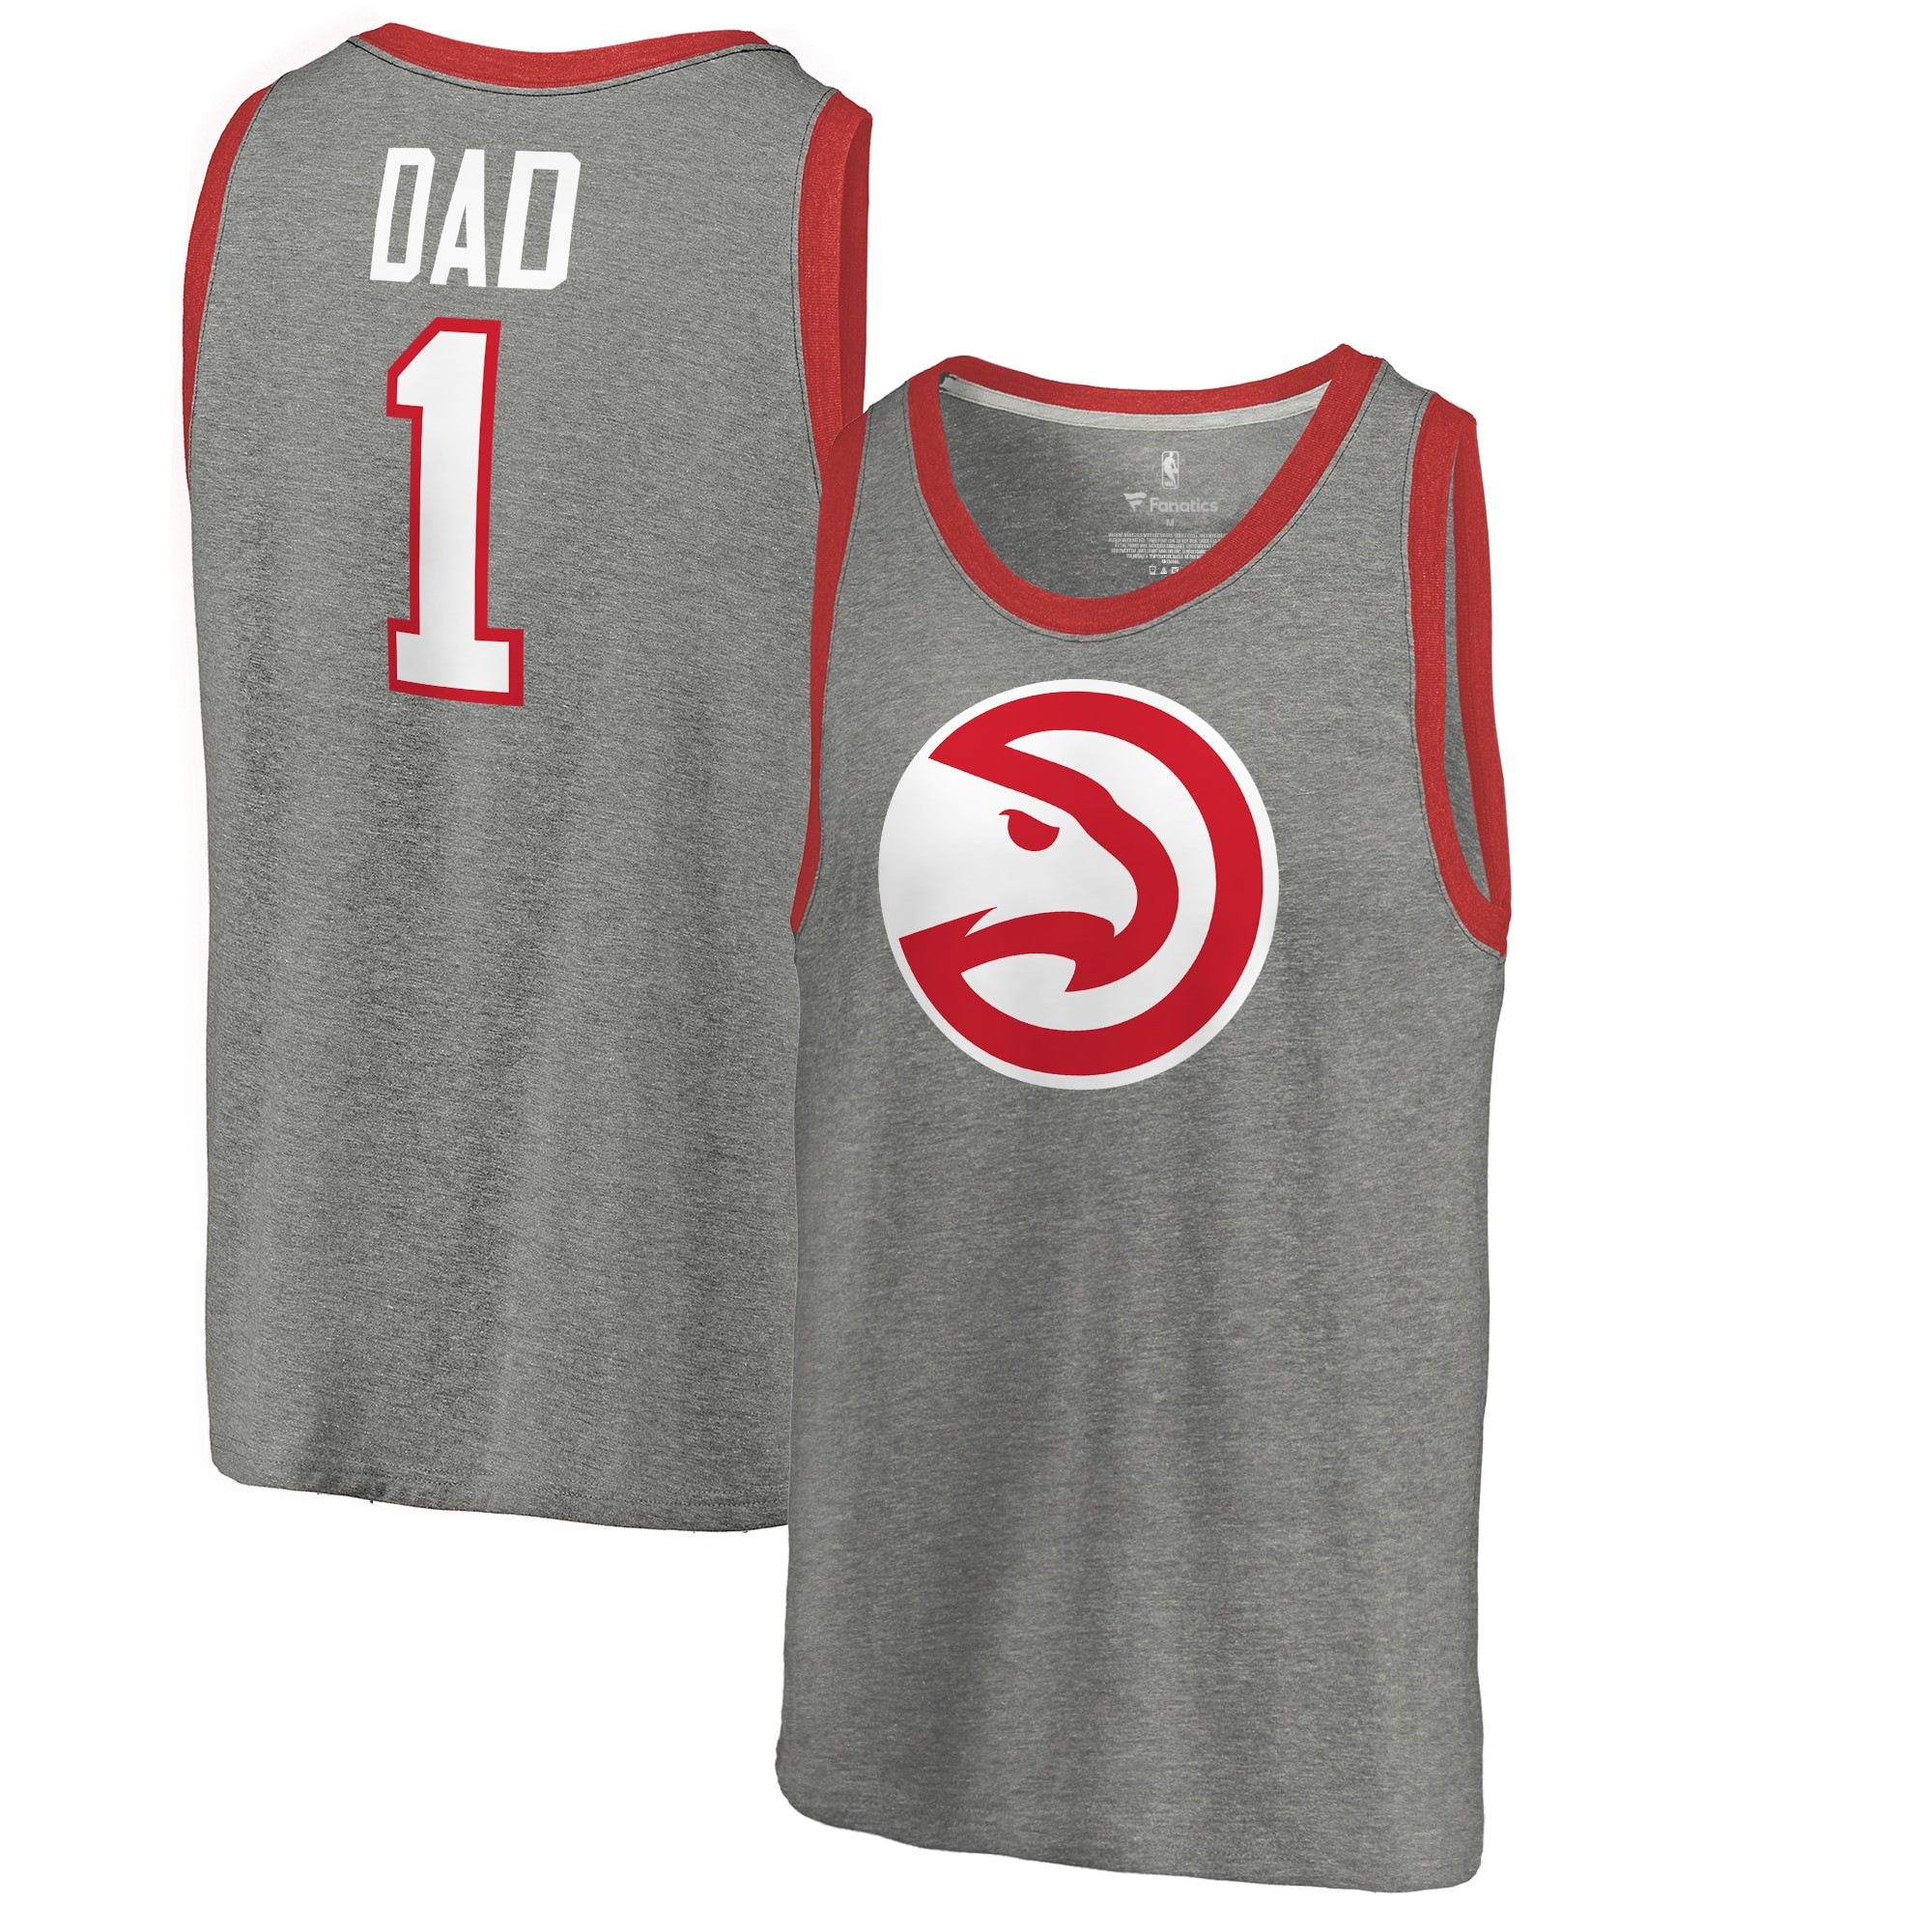 Atlanta Hawks Fanatics Branded #1 Dad Tri-Blend Tank Top - Ash